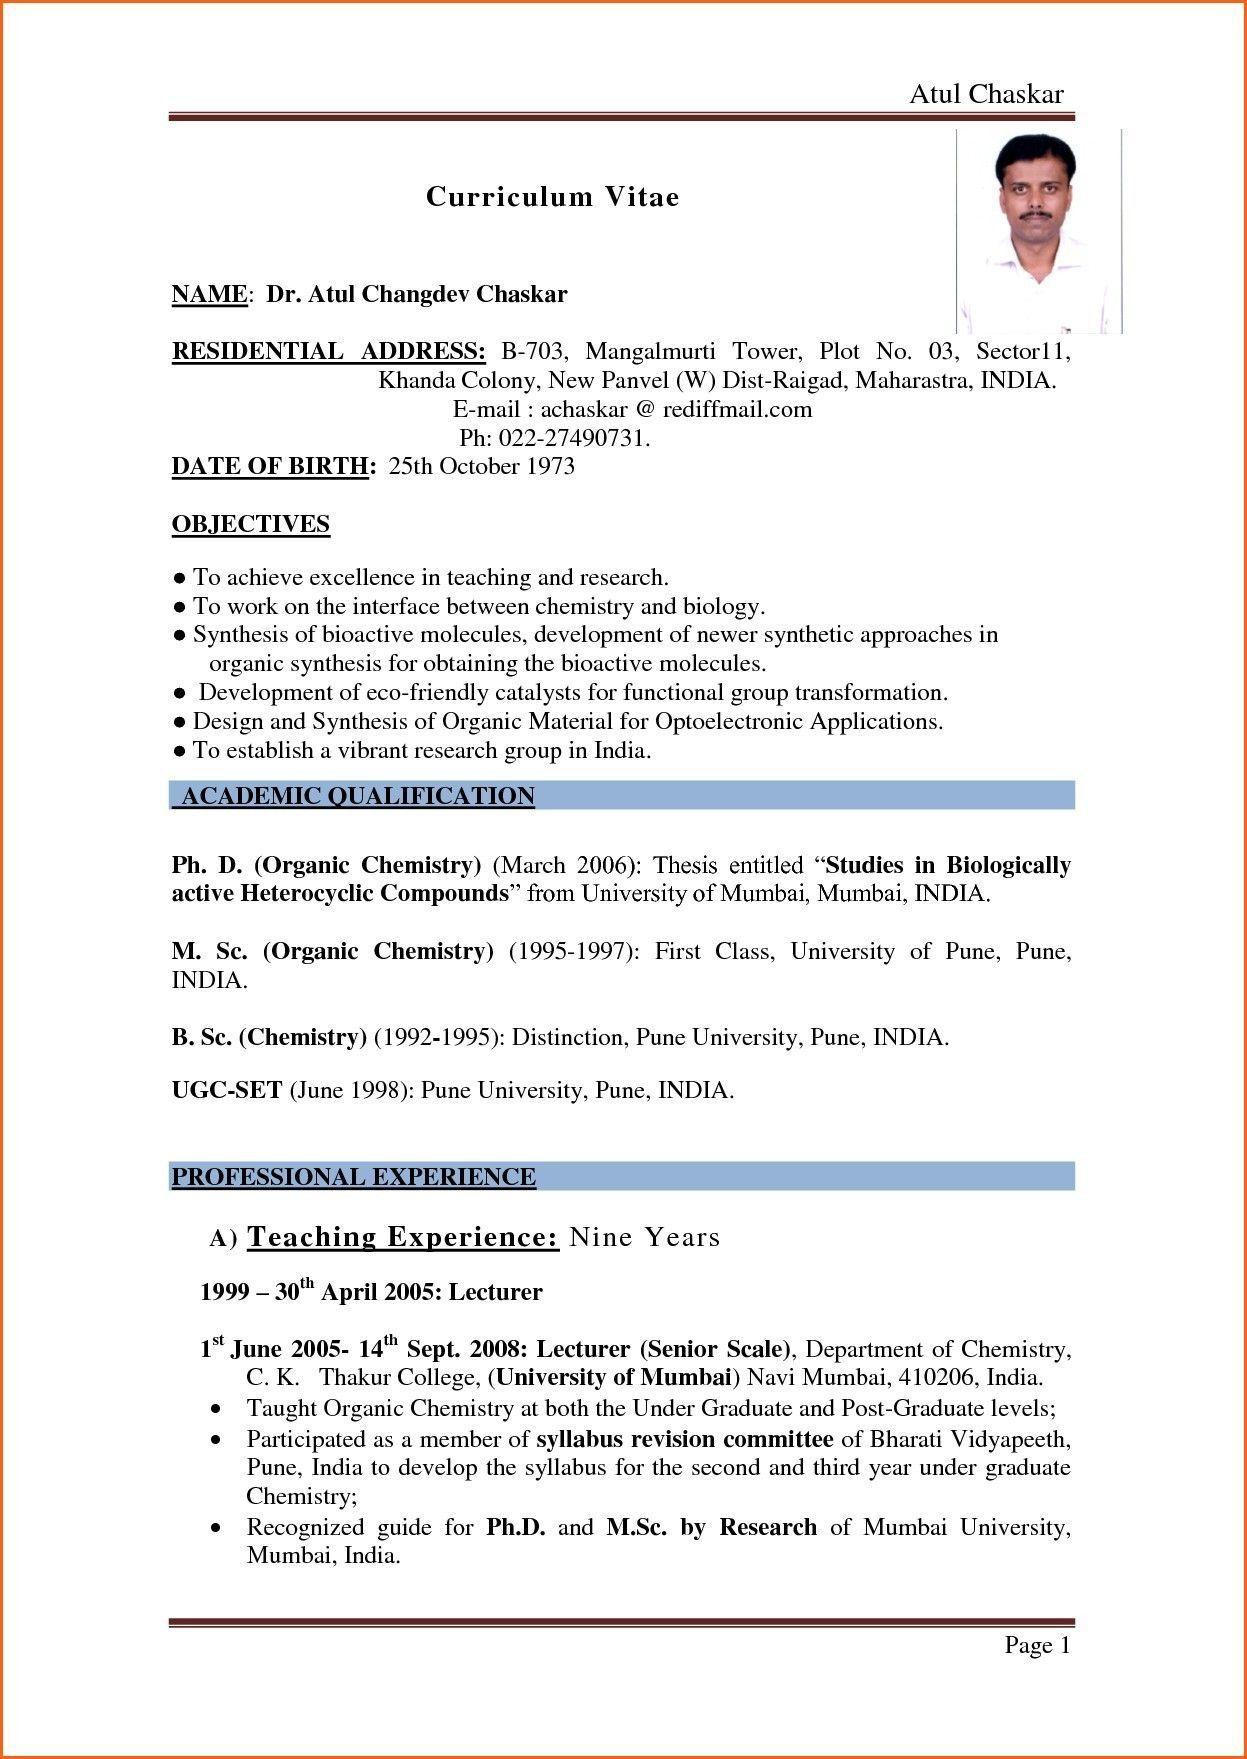 003 Singular Resume Sample For Teaching Job In India Image  School Principal PositionFull